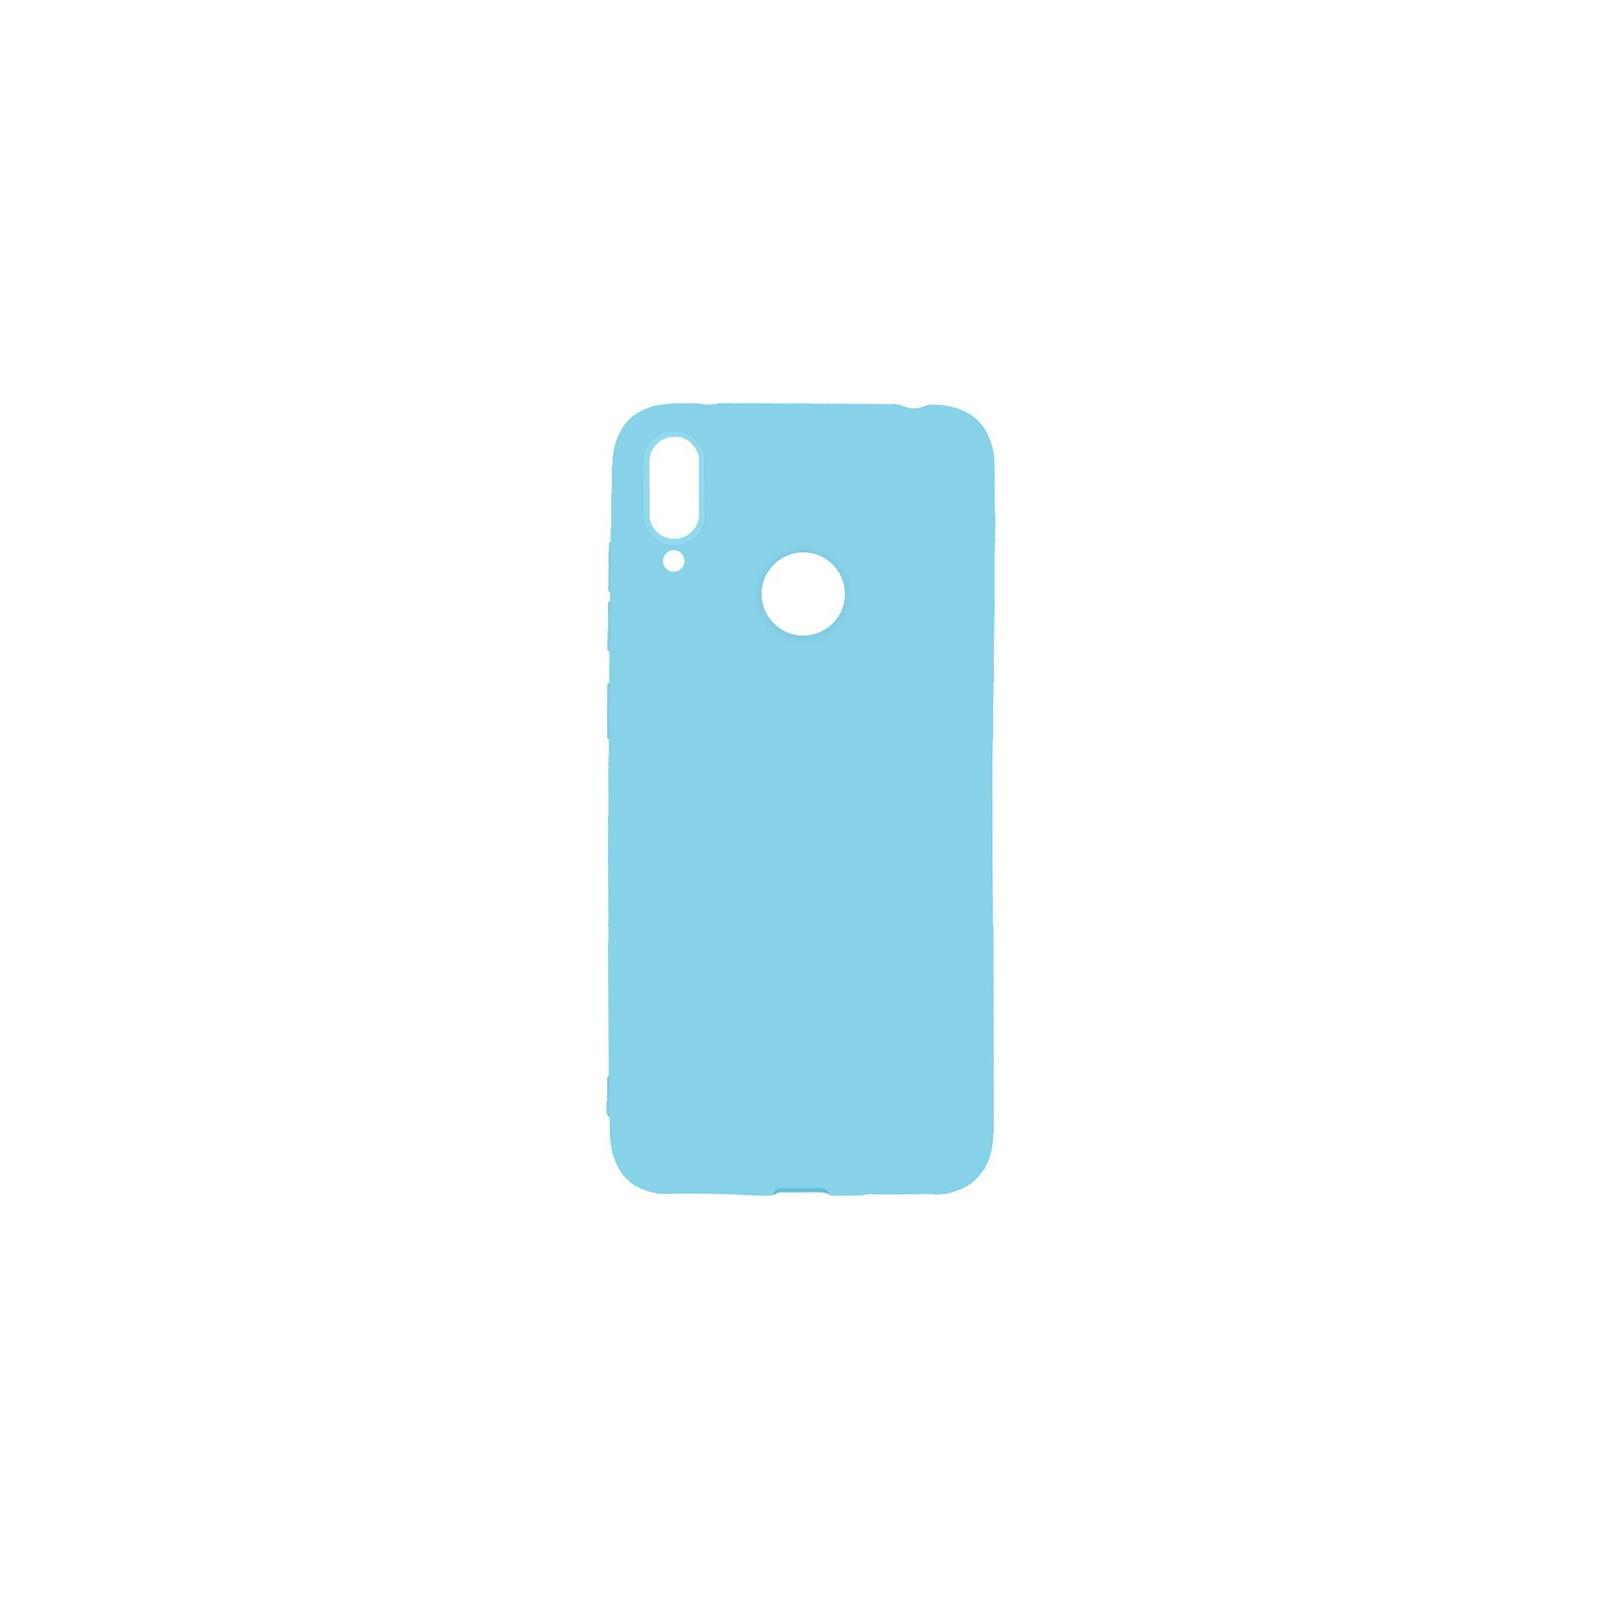 Чехол для моб. телефона Toto 1mm Matt TPU Case Huawei Y7 2019 Ocean Blue (F_94006)